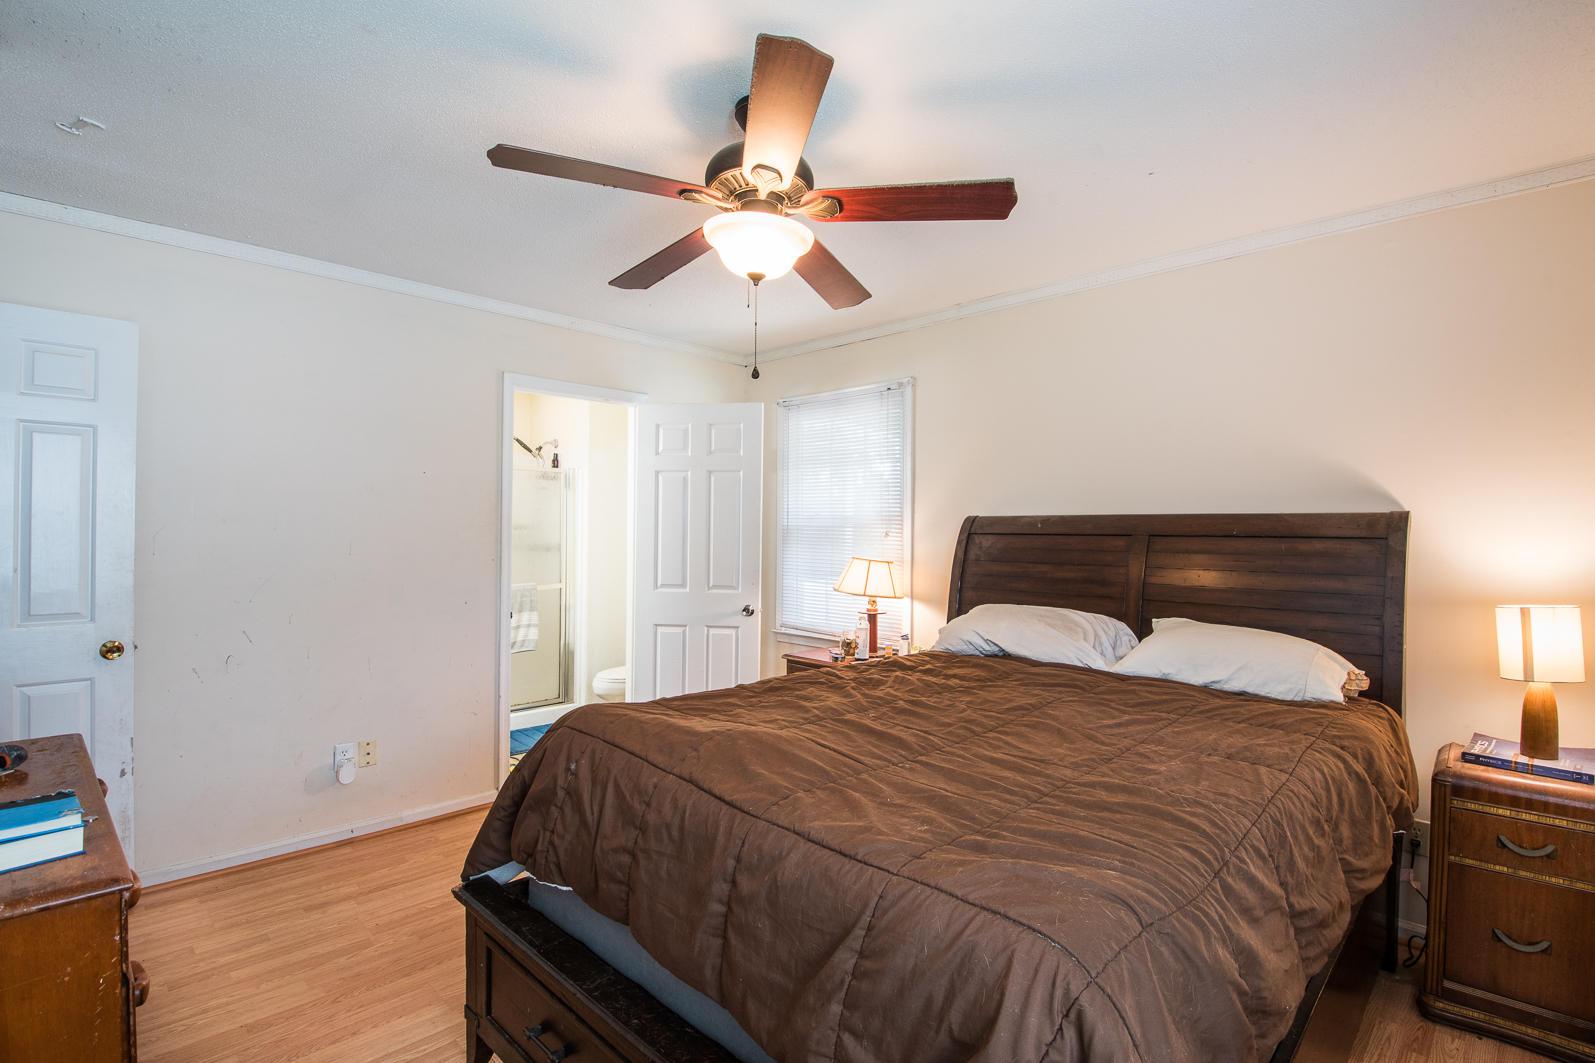 Wando East Homes For Sale - 1605 Babington, Mount Pleasant, SC - 19